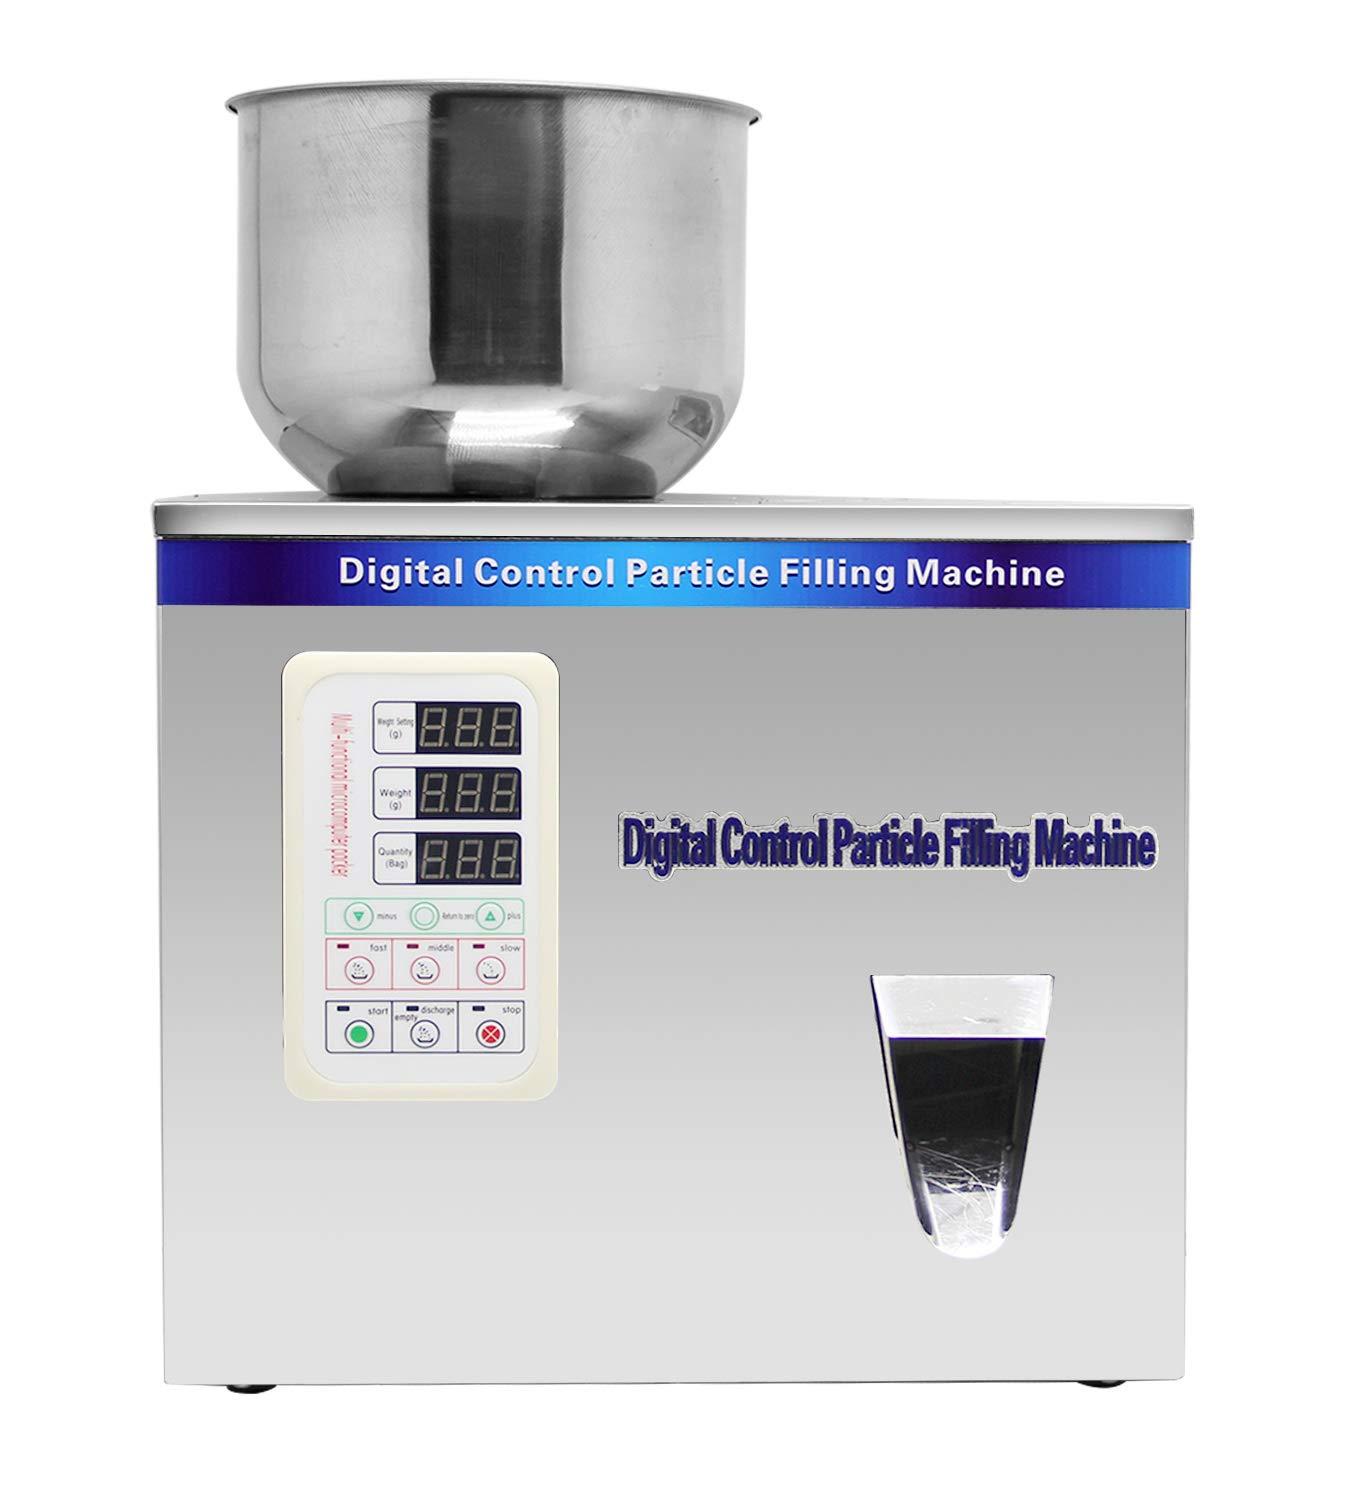 Hanchen Powder Filling Machine 1-50g Particle Weighing Filling Machine Automatic 110v Powder Filler for Tea Seeds Grains Powder